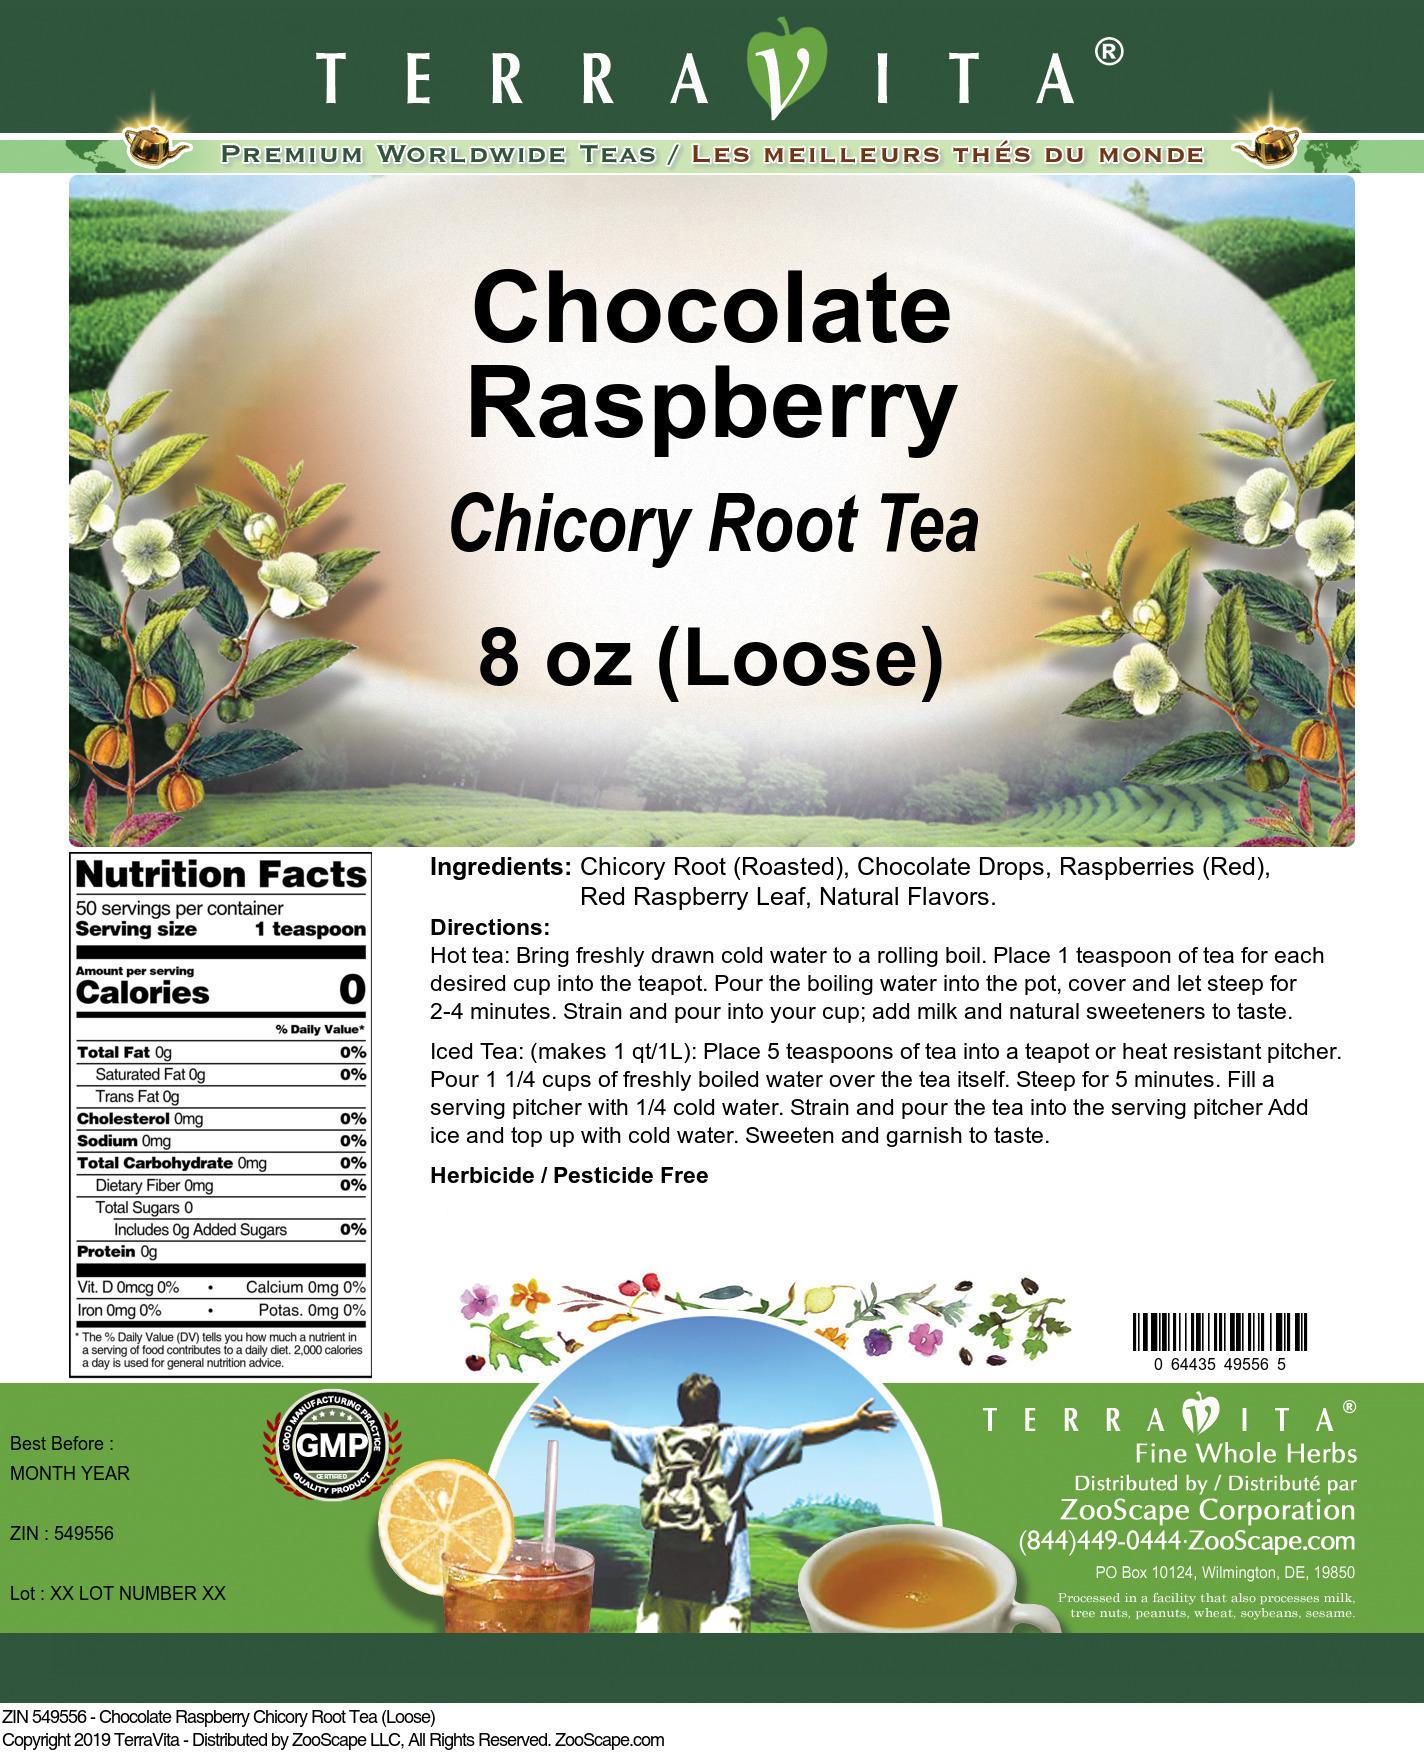 Chocolate Raspberry Chicory Root Tea (Loose)